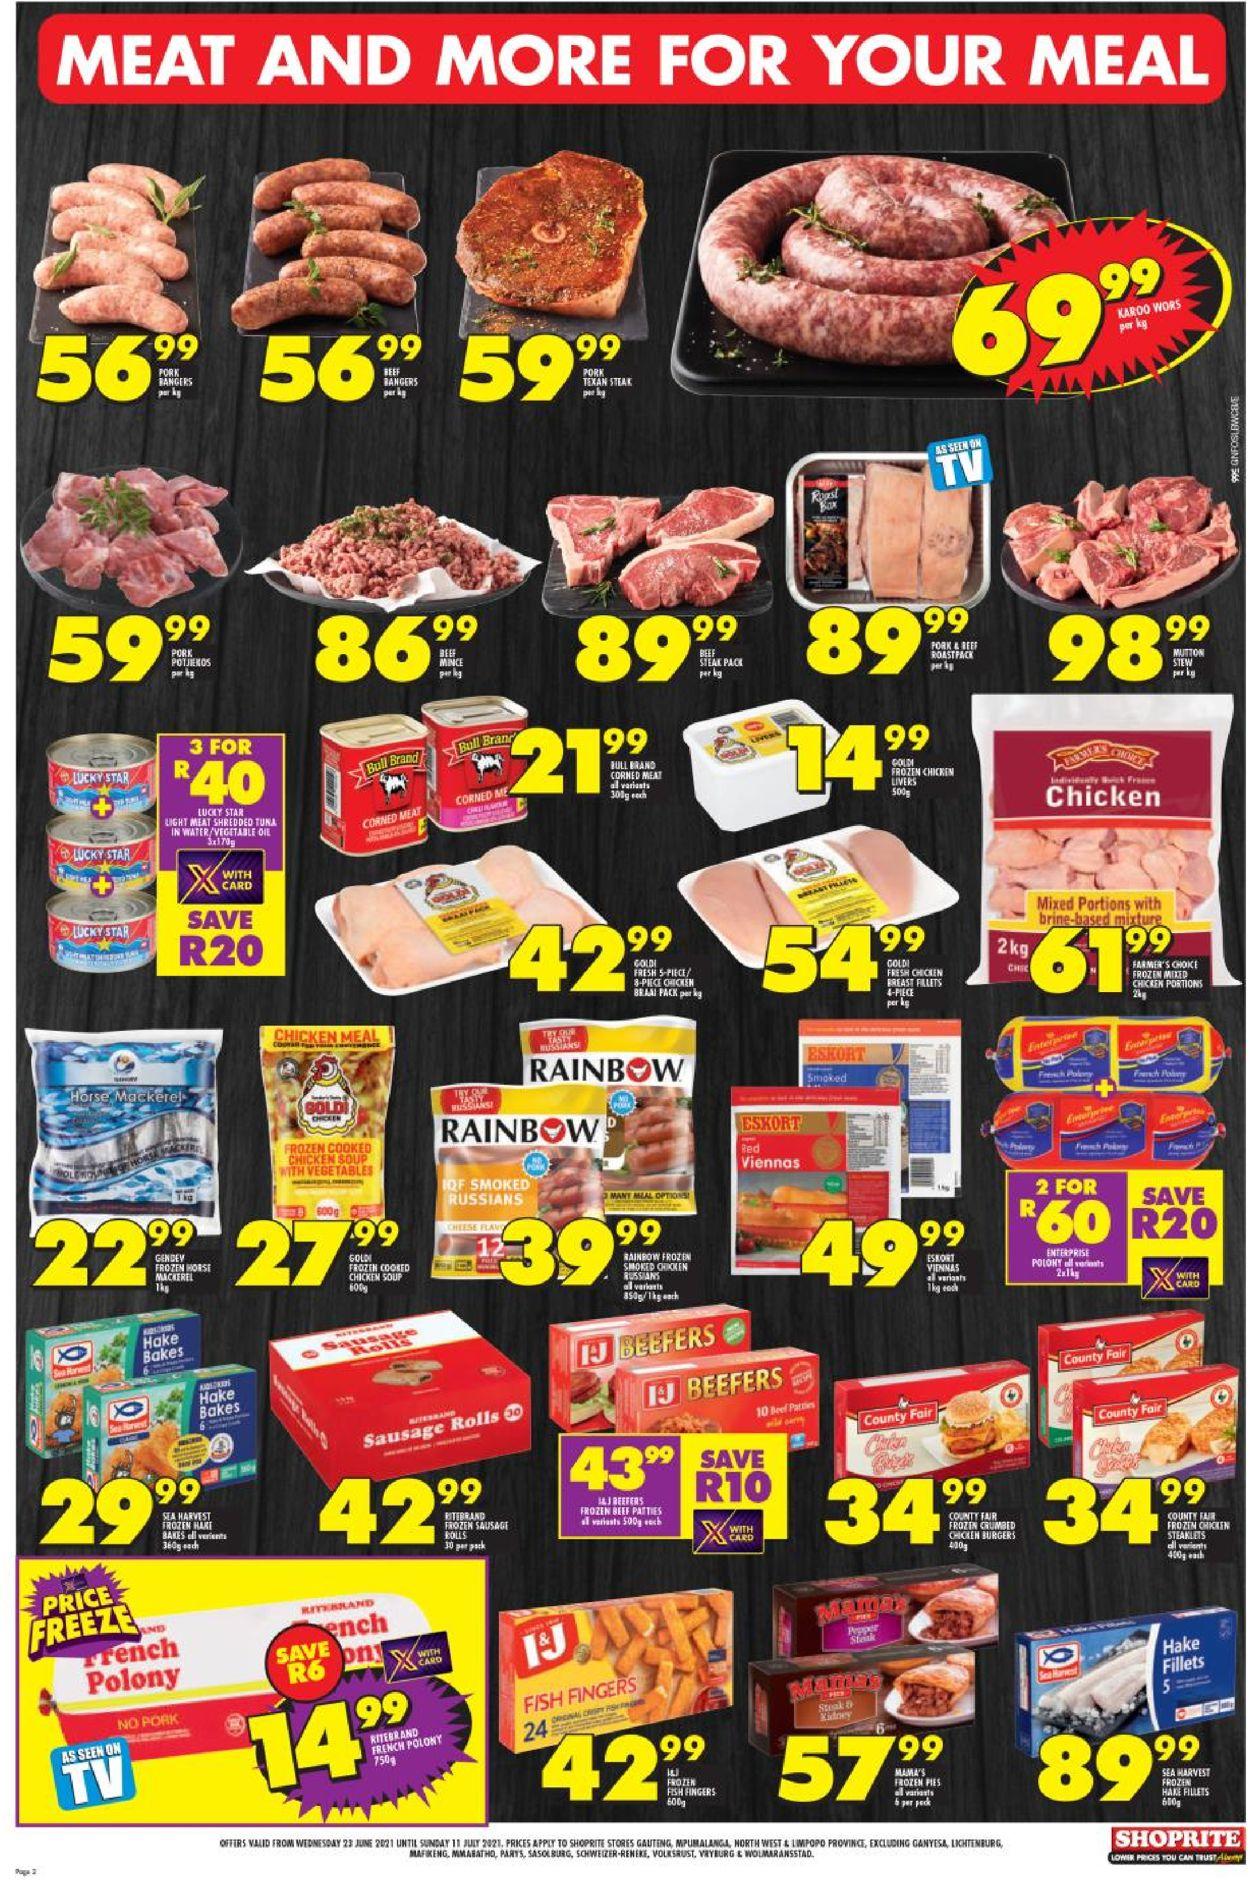 Shoprite Catalogue - 2021/06/23-2021/07/11 (Page 2)